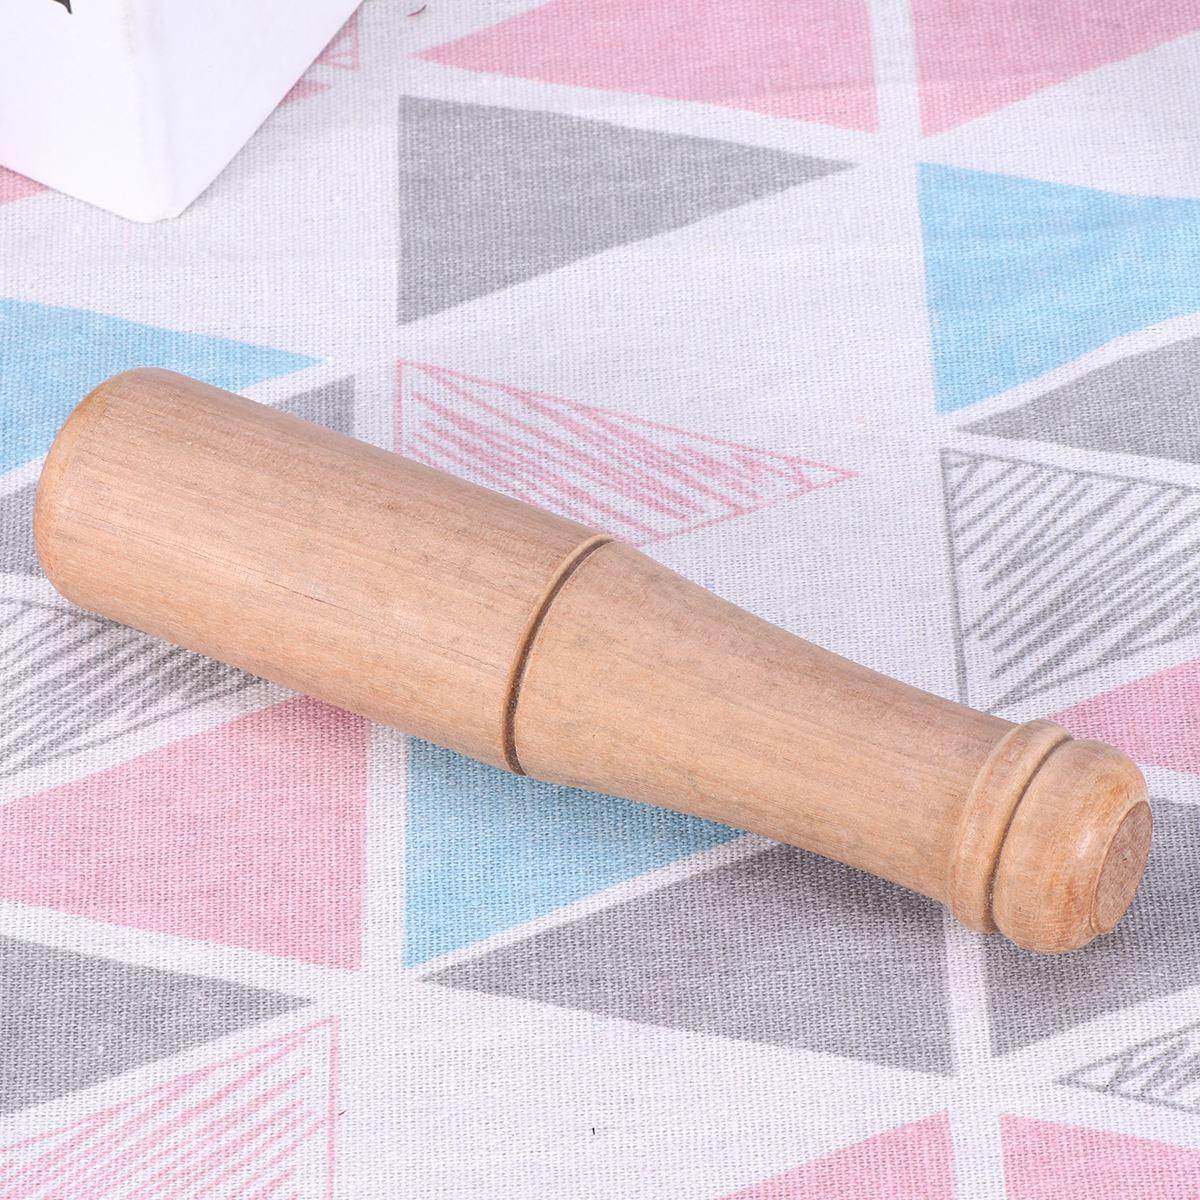 1 PC Wooden Pestle Muddler Garlic Press Spice Grinder Mashers Tool For Home Kitchen Use Kitchen Gadgets Random Color in Mills from Home Garden